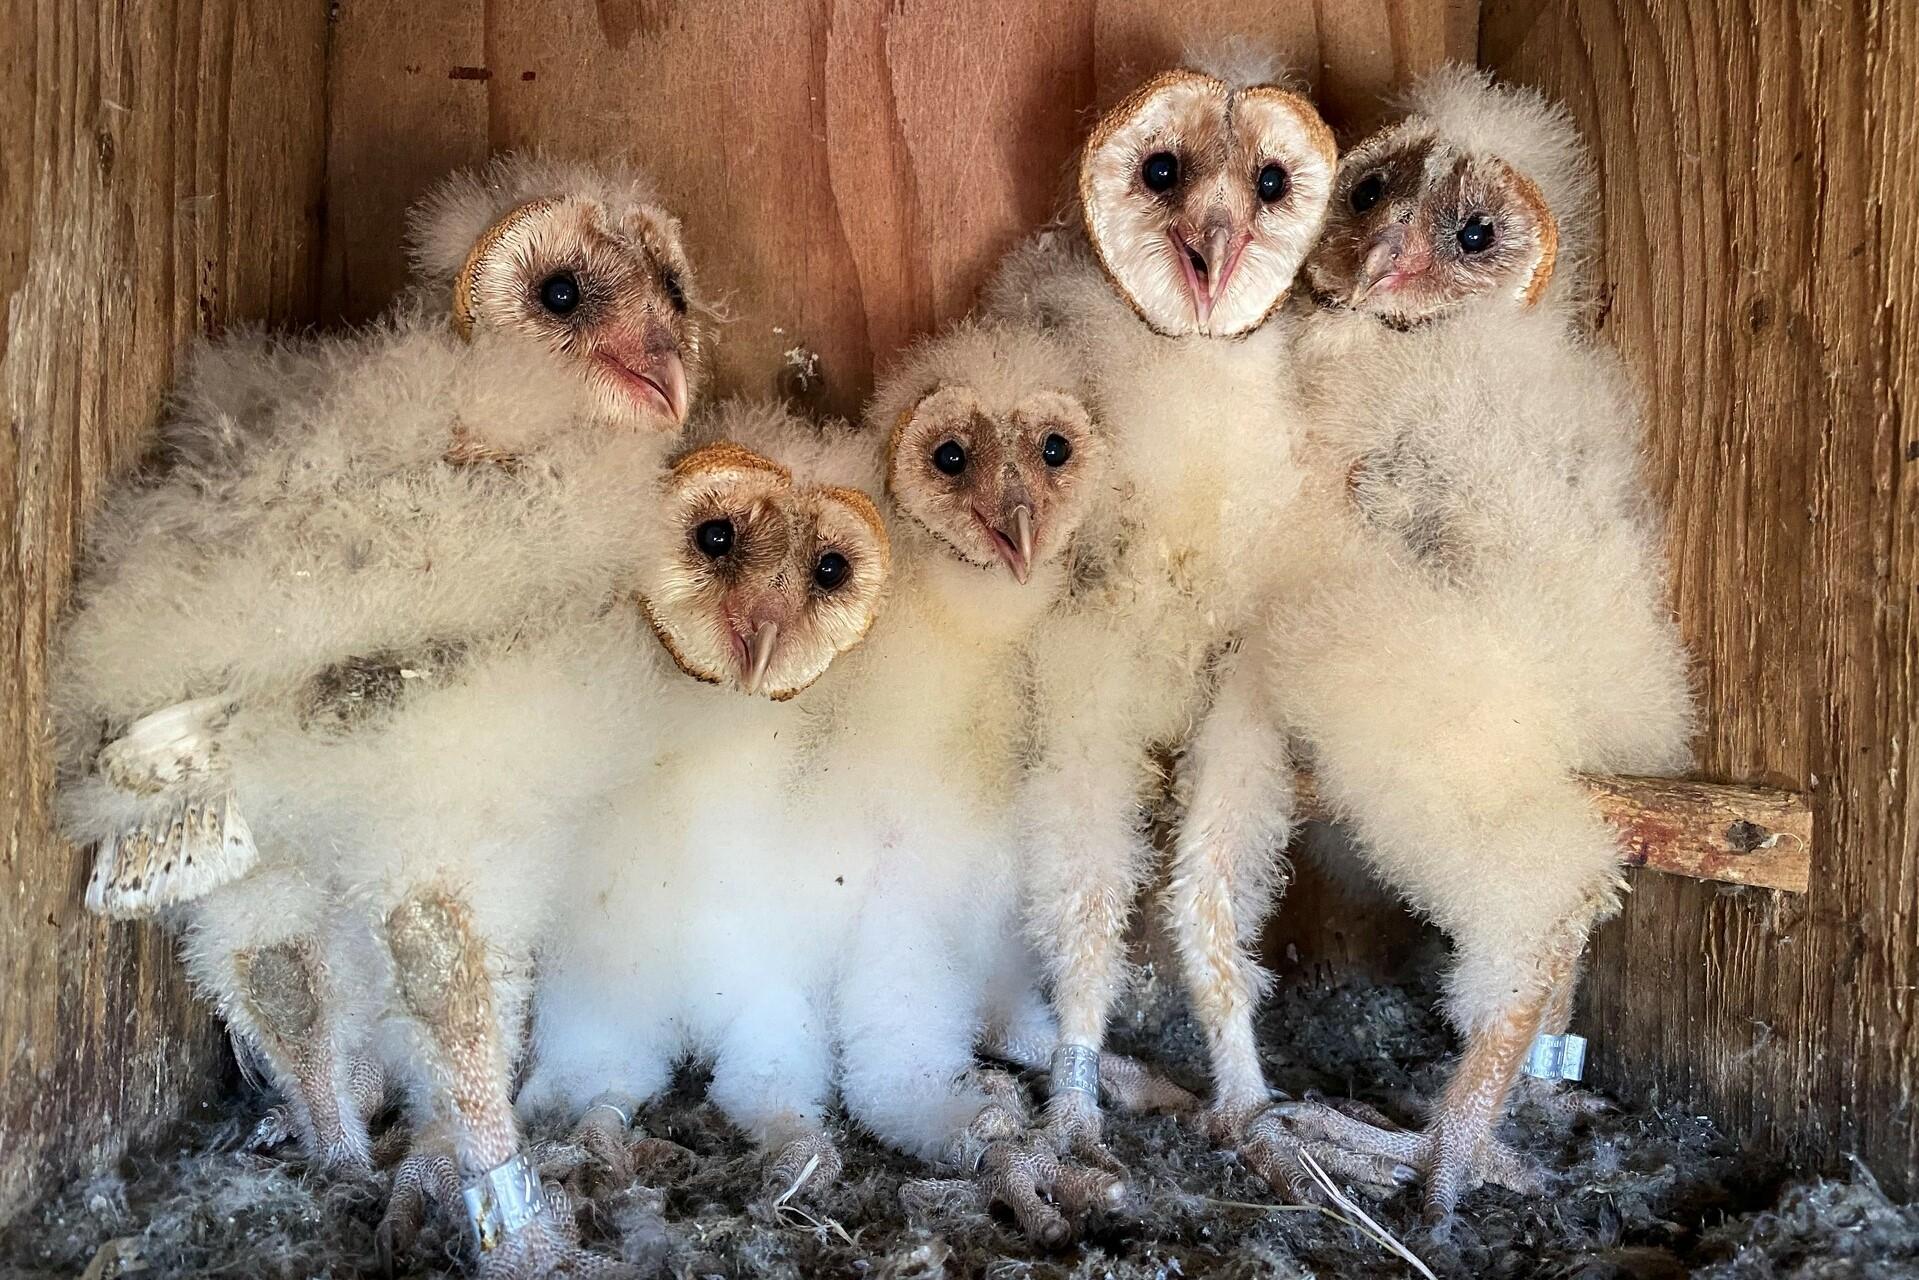 A group of infant owls gather inside a birdbox.